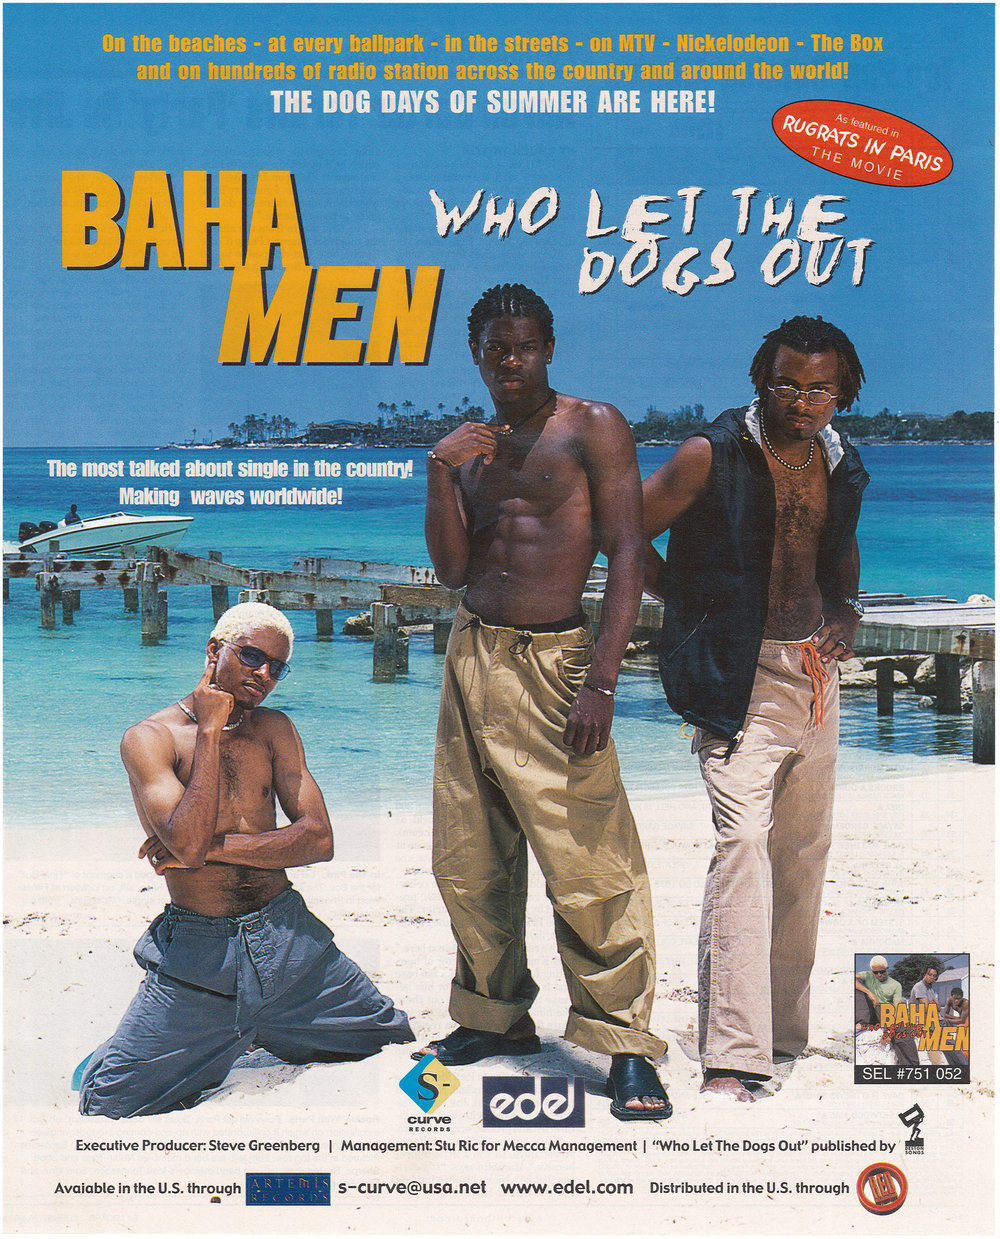 WLWLTDOO-2001-BAHA_MEN-BILLBOARD_ADVERT-DOG_DAYS.jpg